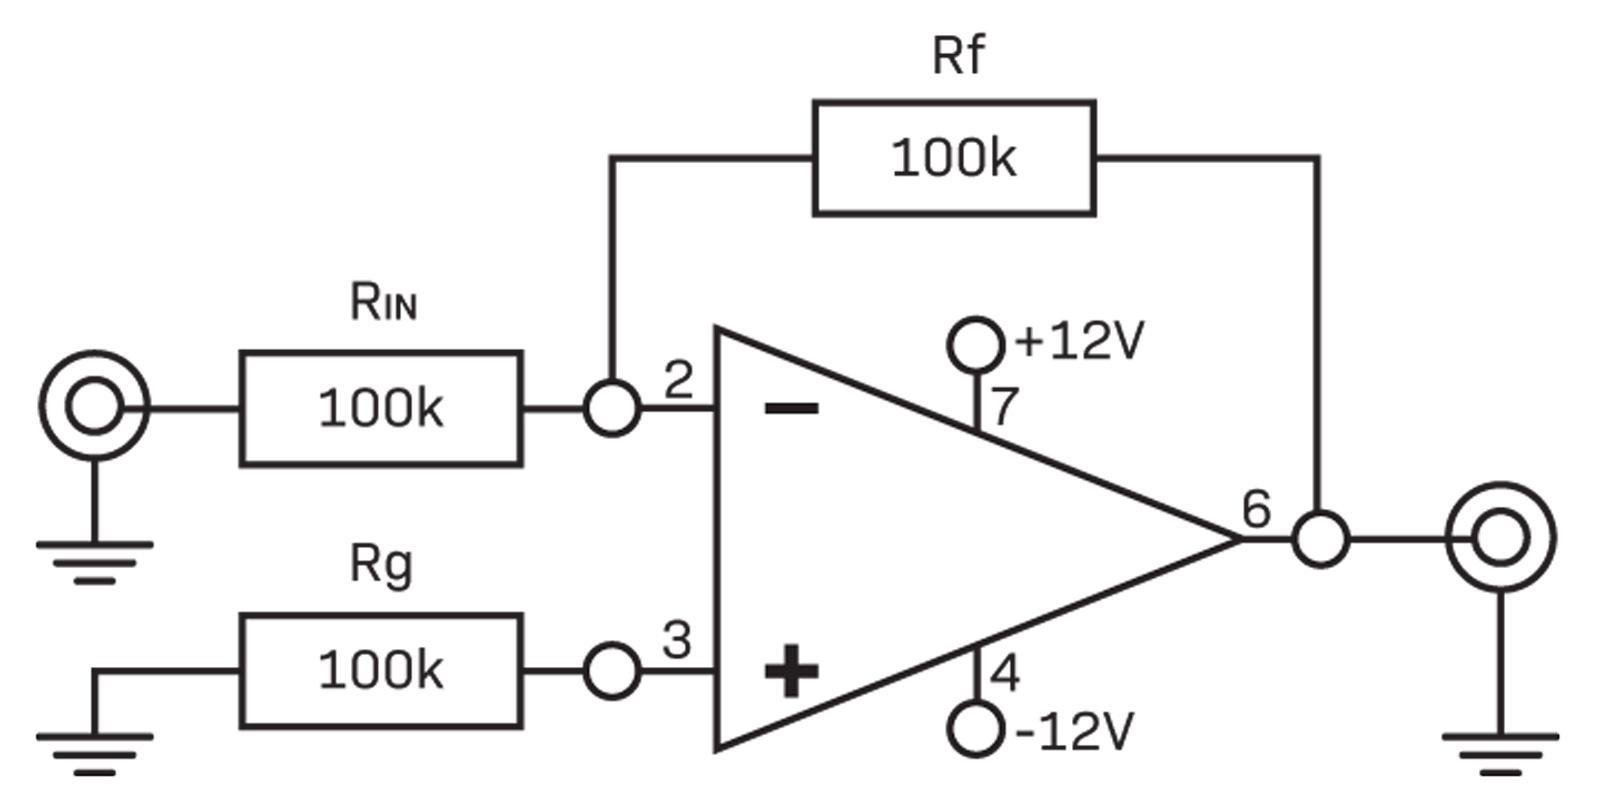 Buffers Inverters Diyode Magazine Single Polarity Supply By Ic Lm741 Inverter Inverting Buffer